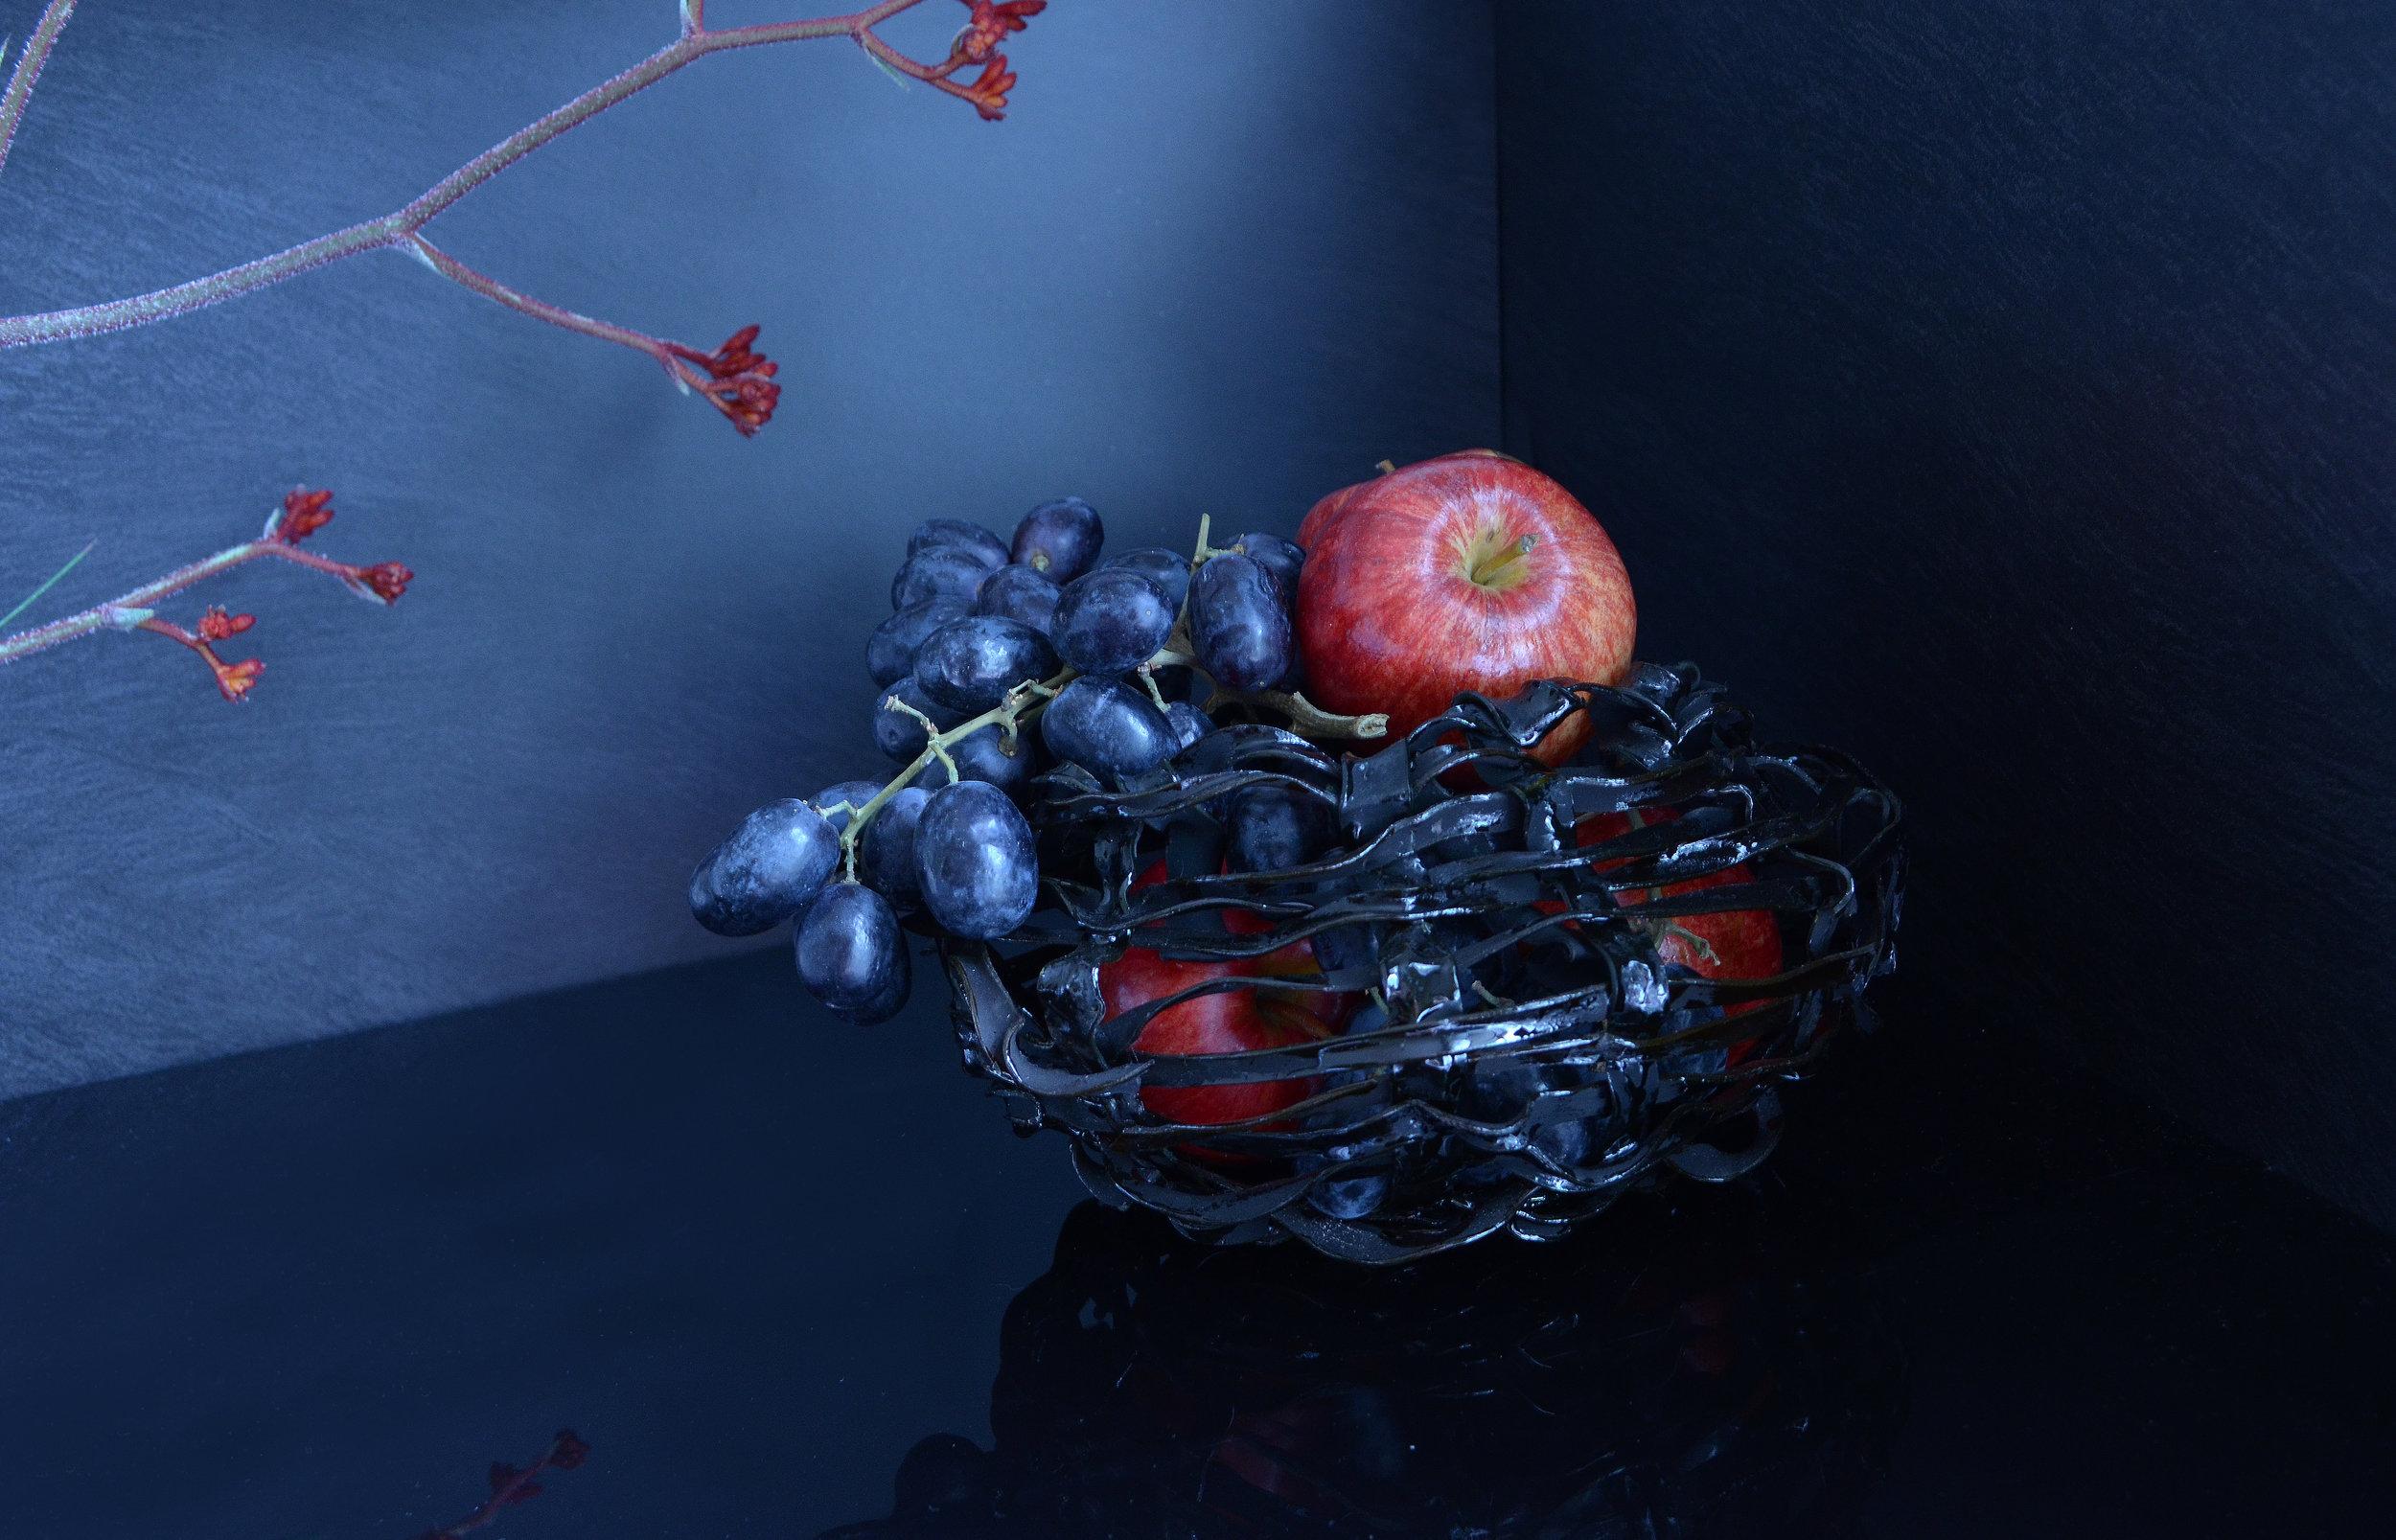 fruitbasket1.jpg